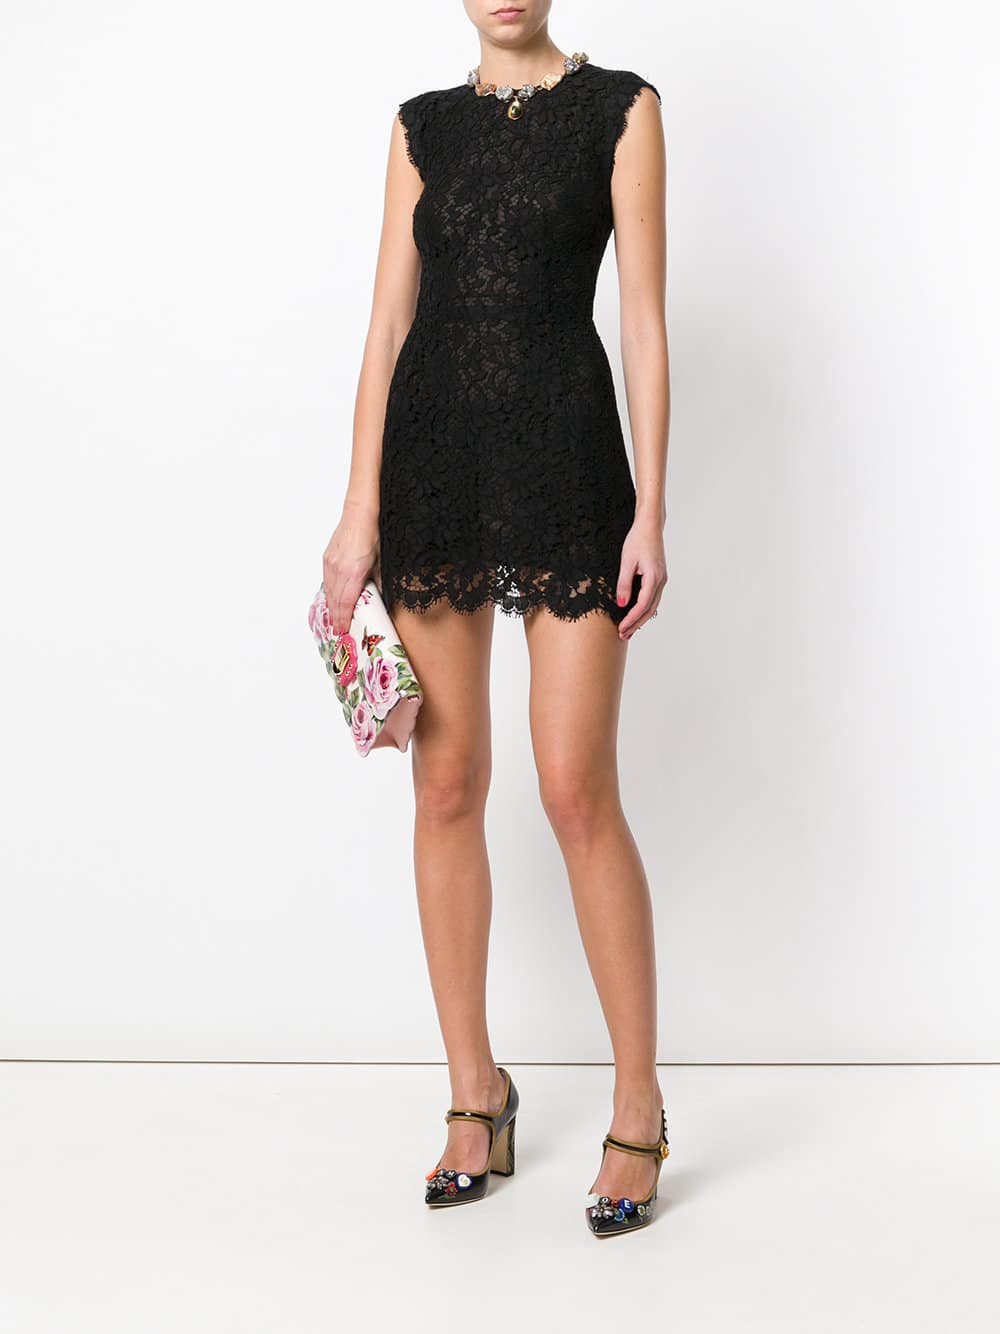 15b0f04f81 DOLCE   GABBANA Floral Lace Black Dress - We Select Dresses